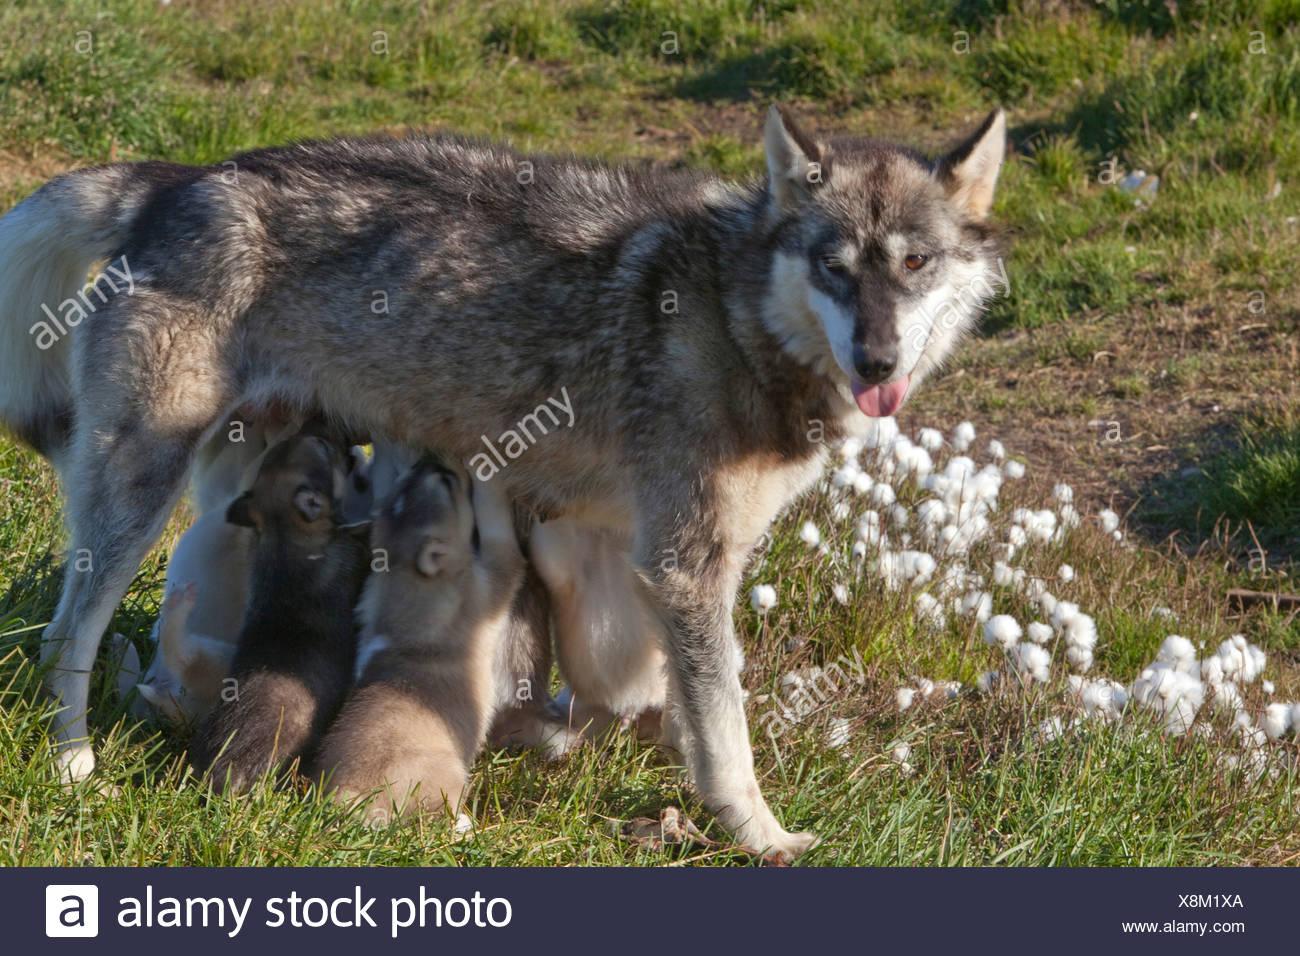 young, sledge dogs, Greenland, East Greenland, animals, animal, dog, nurse, - Stock Image